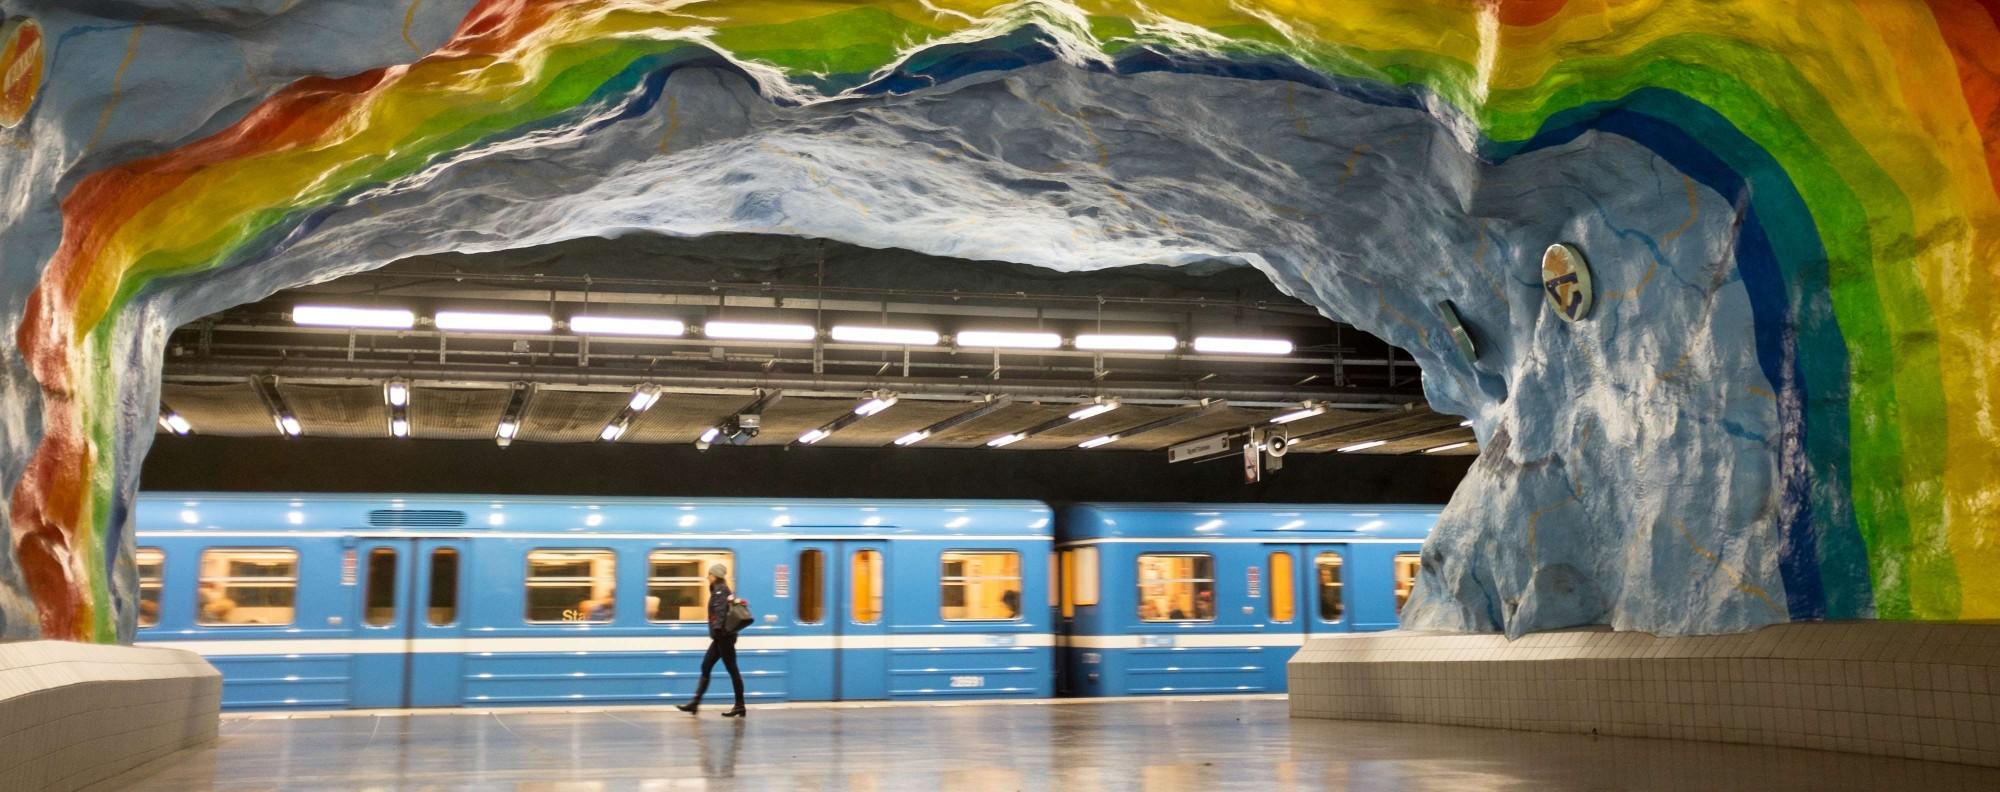 Stadion Station, on the Stockholm metro system